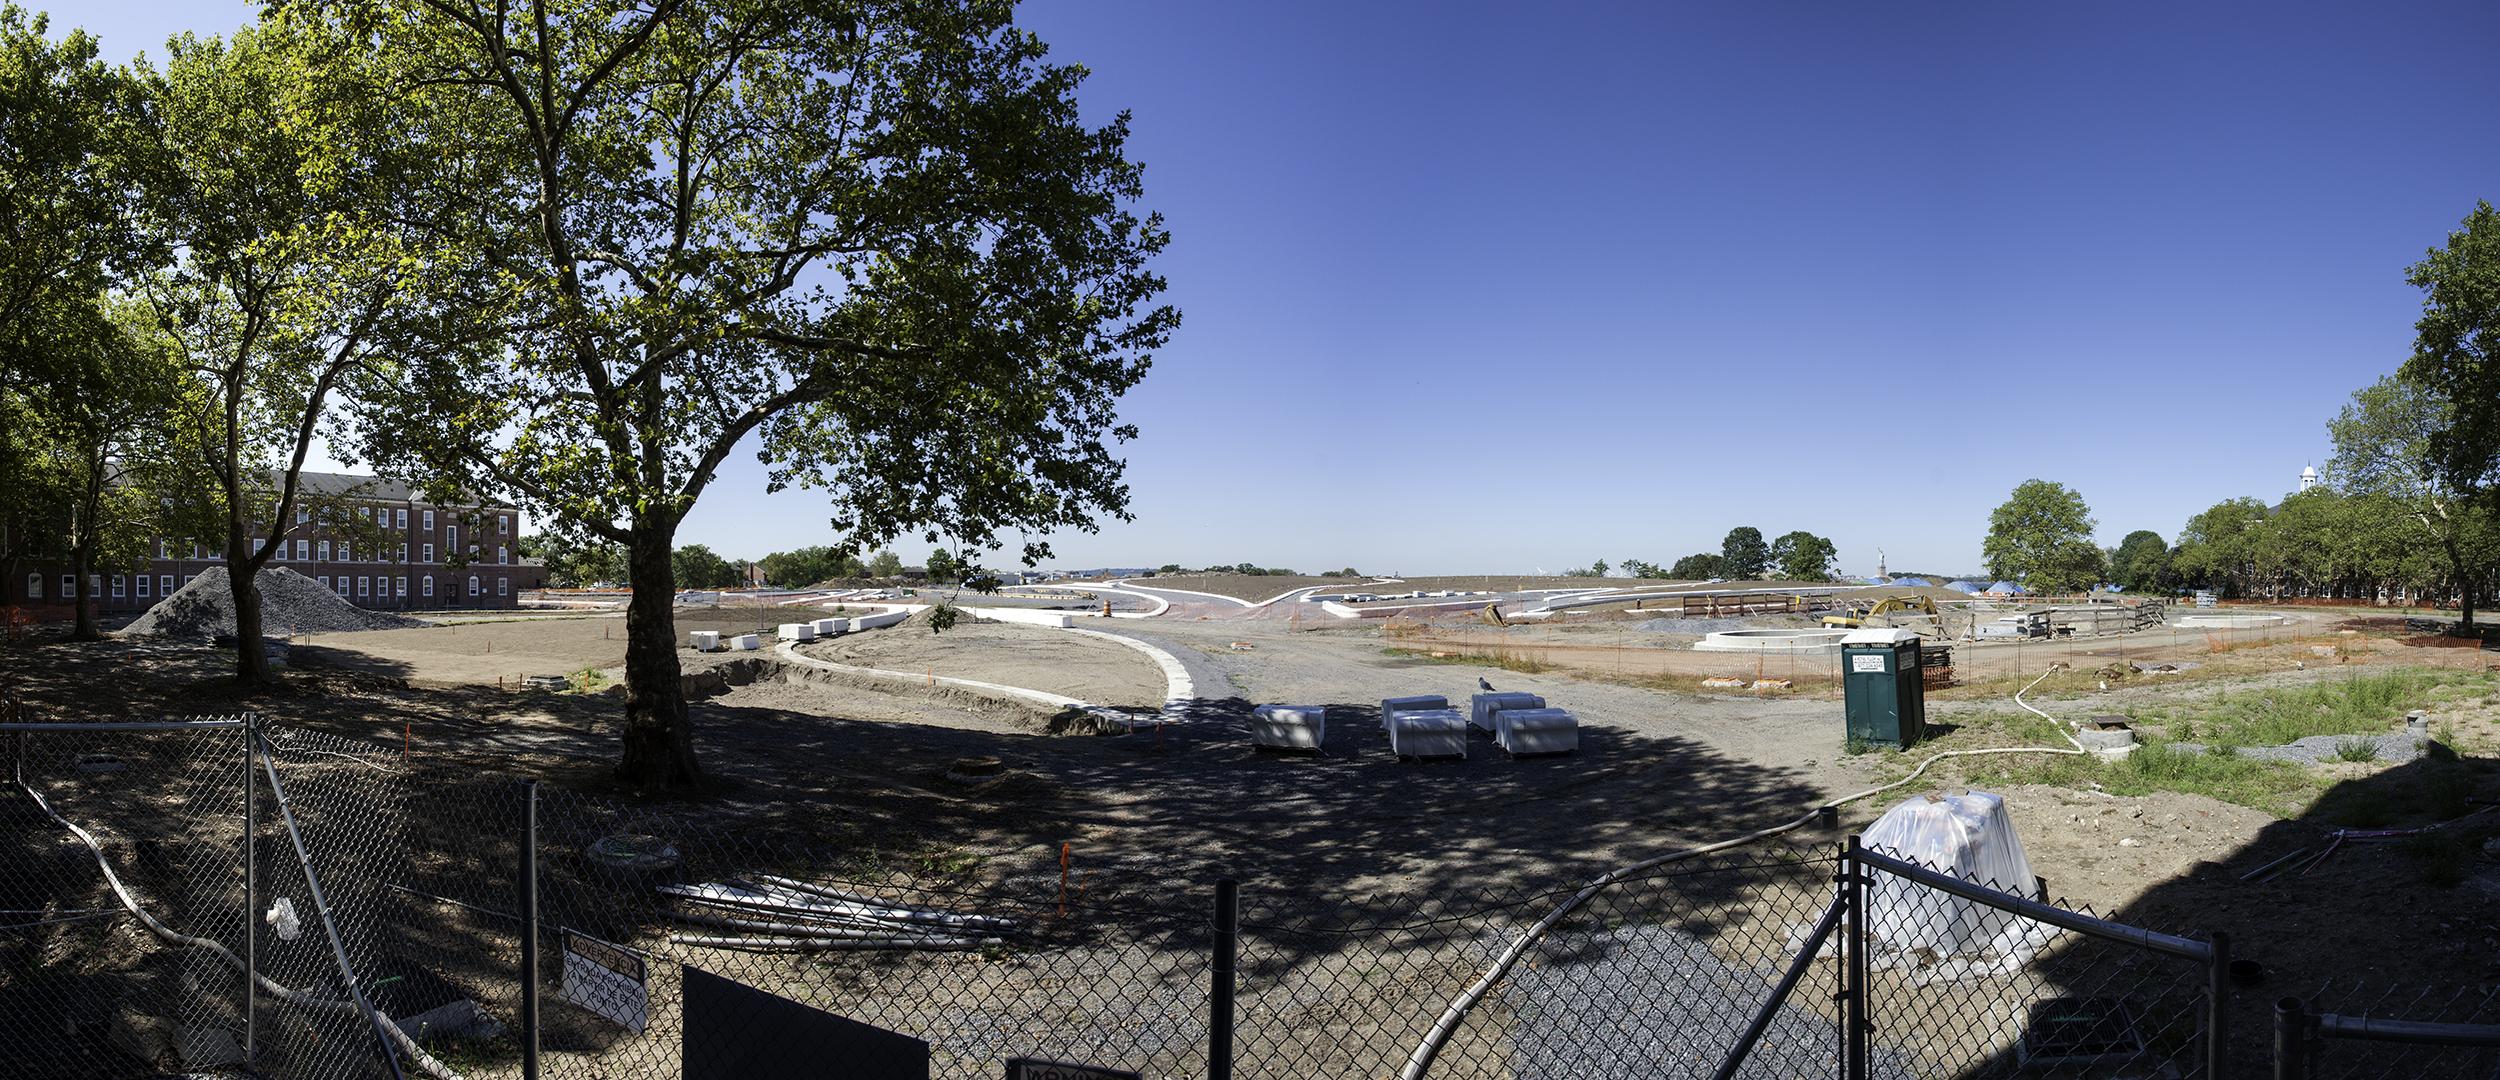 Governors Island Phase One Panorama 01.jpg